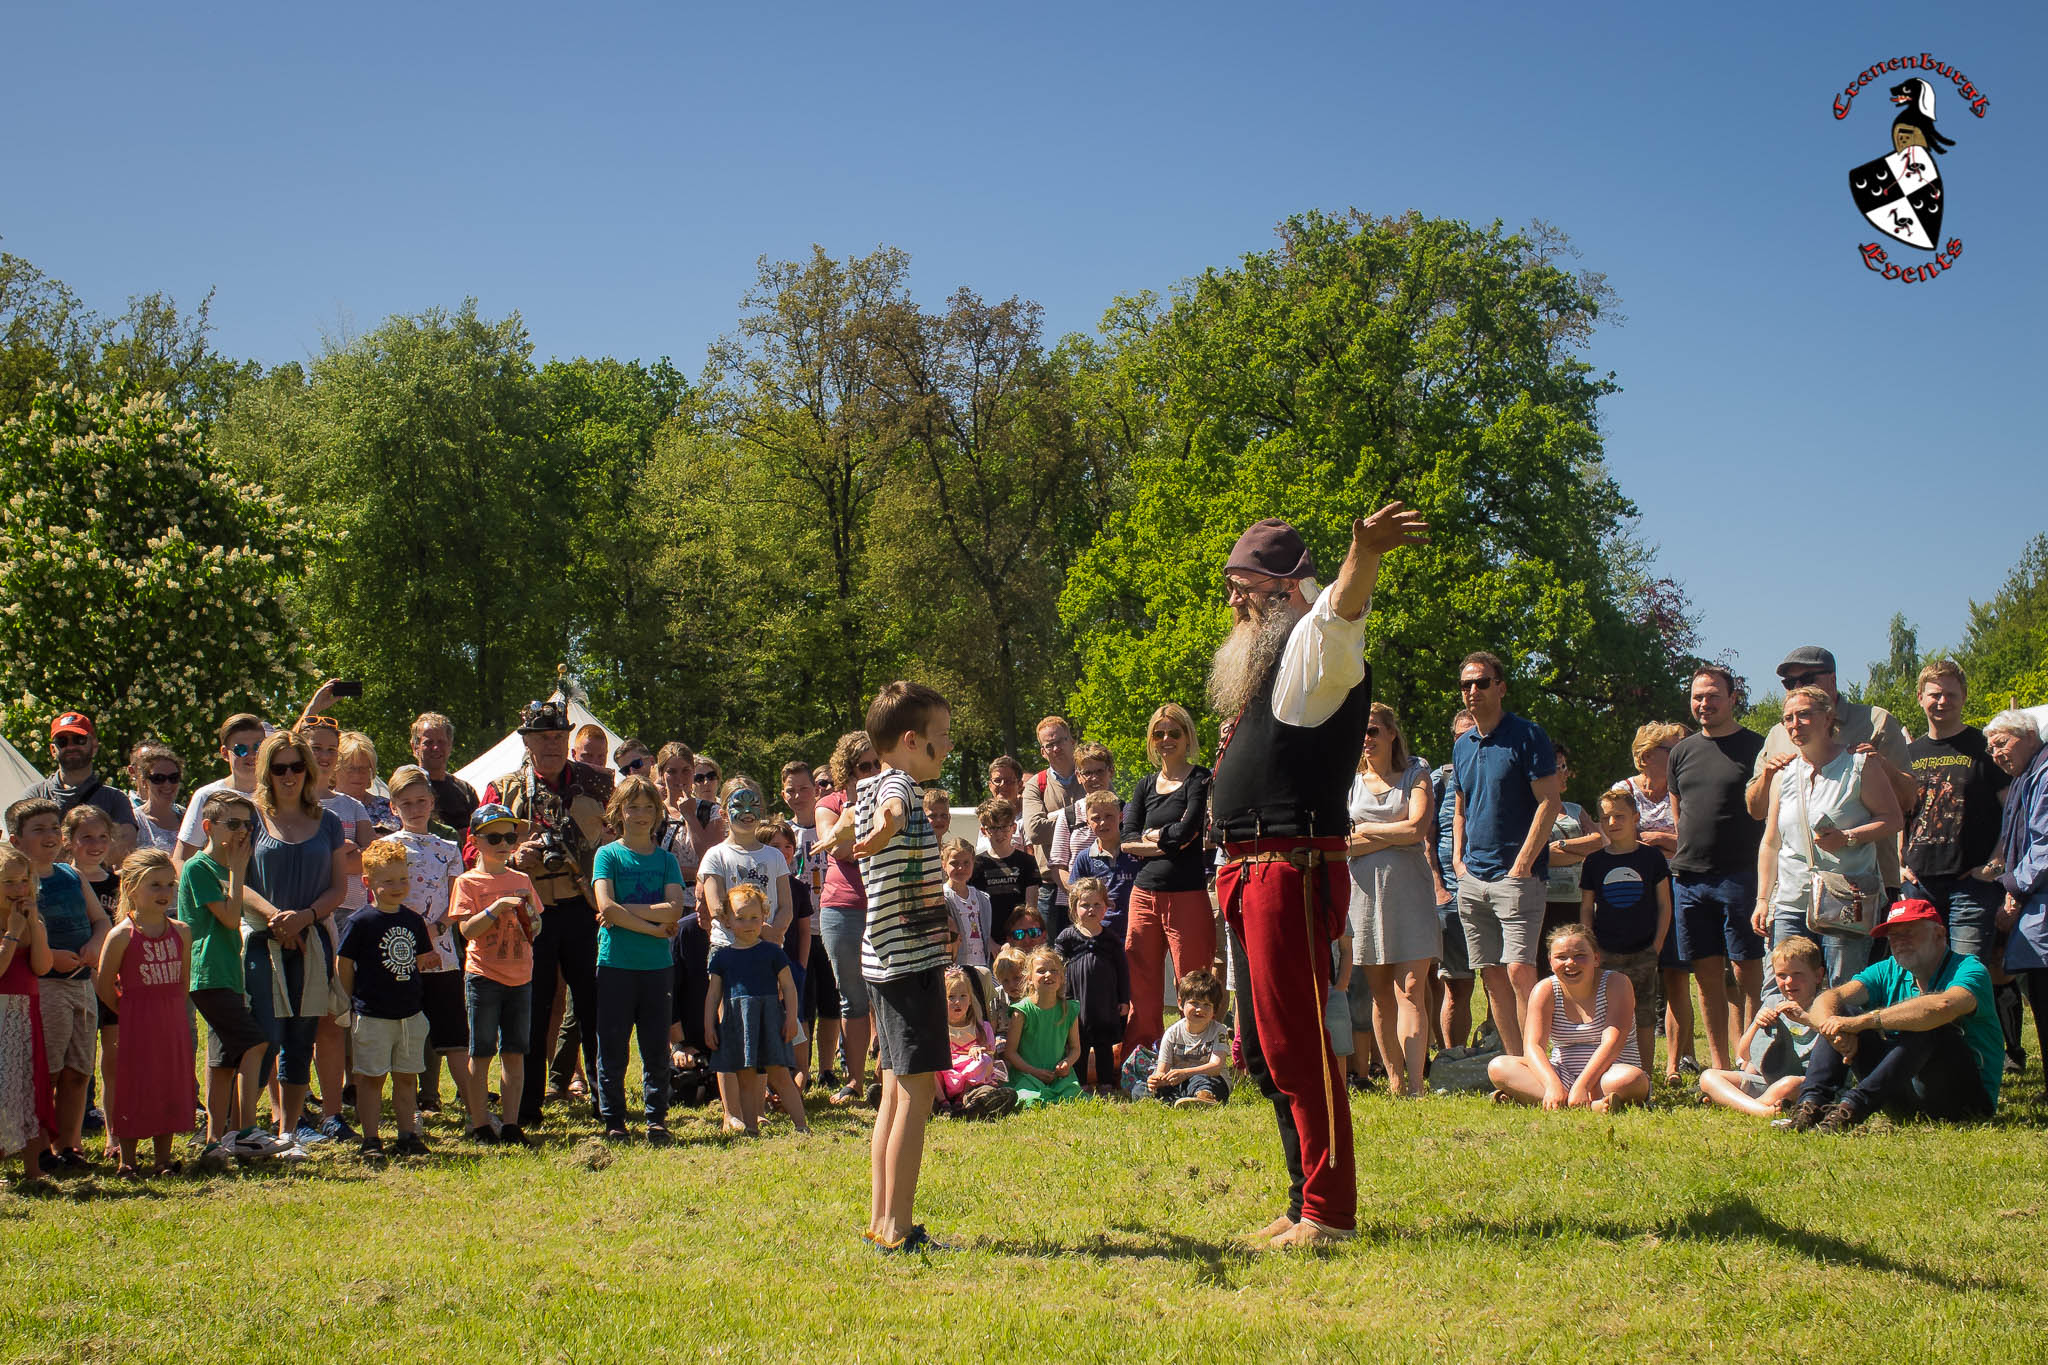 Middeleeuws-Festijn-Cannenburgh-2018-Algemeen-Ellen-la-Faille-11